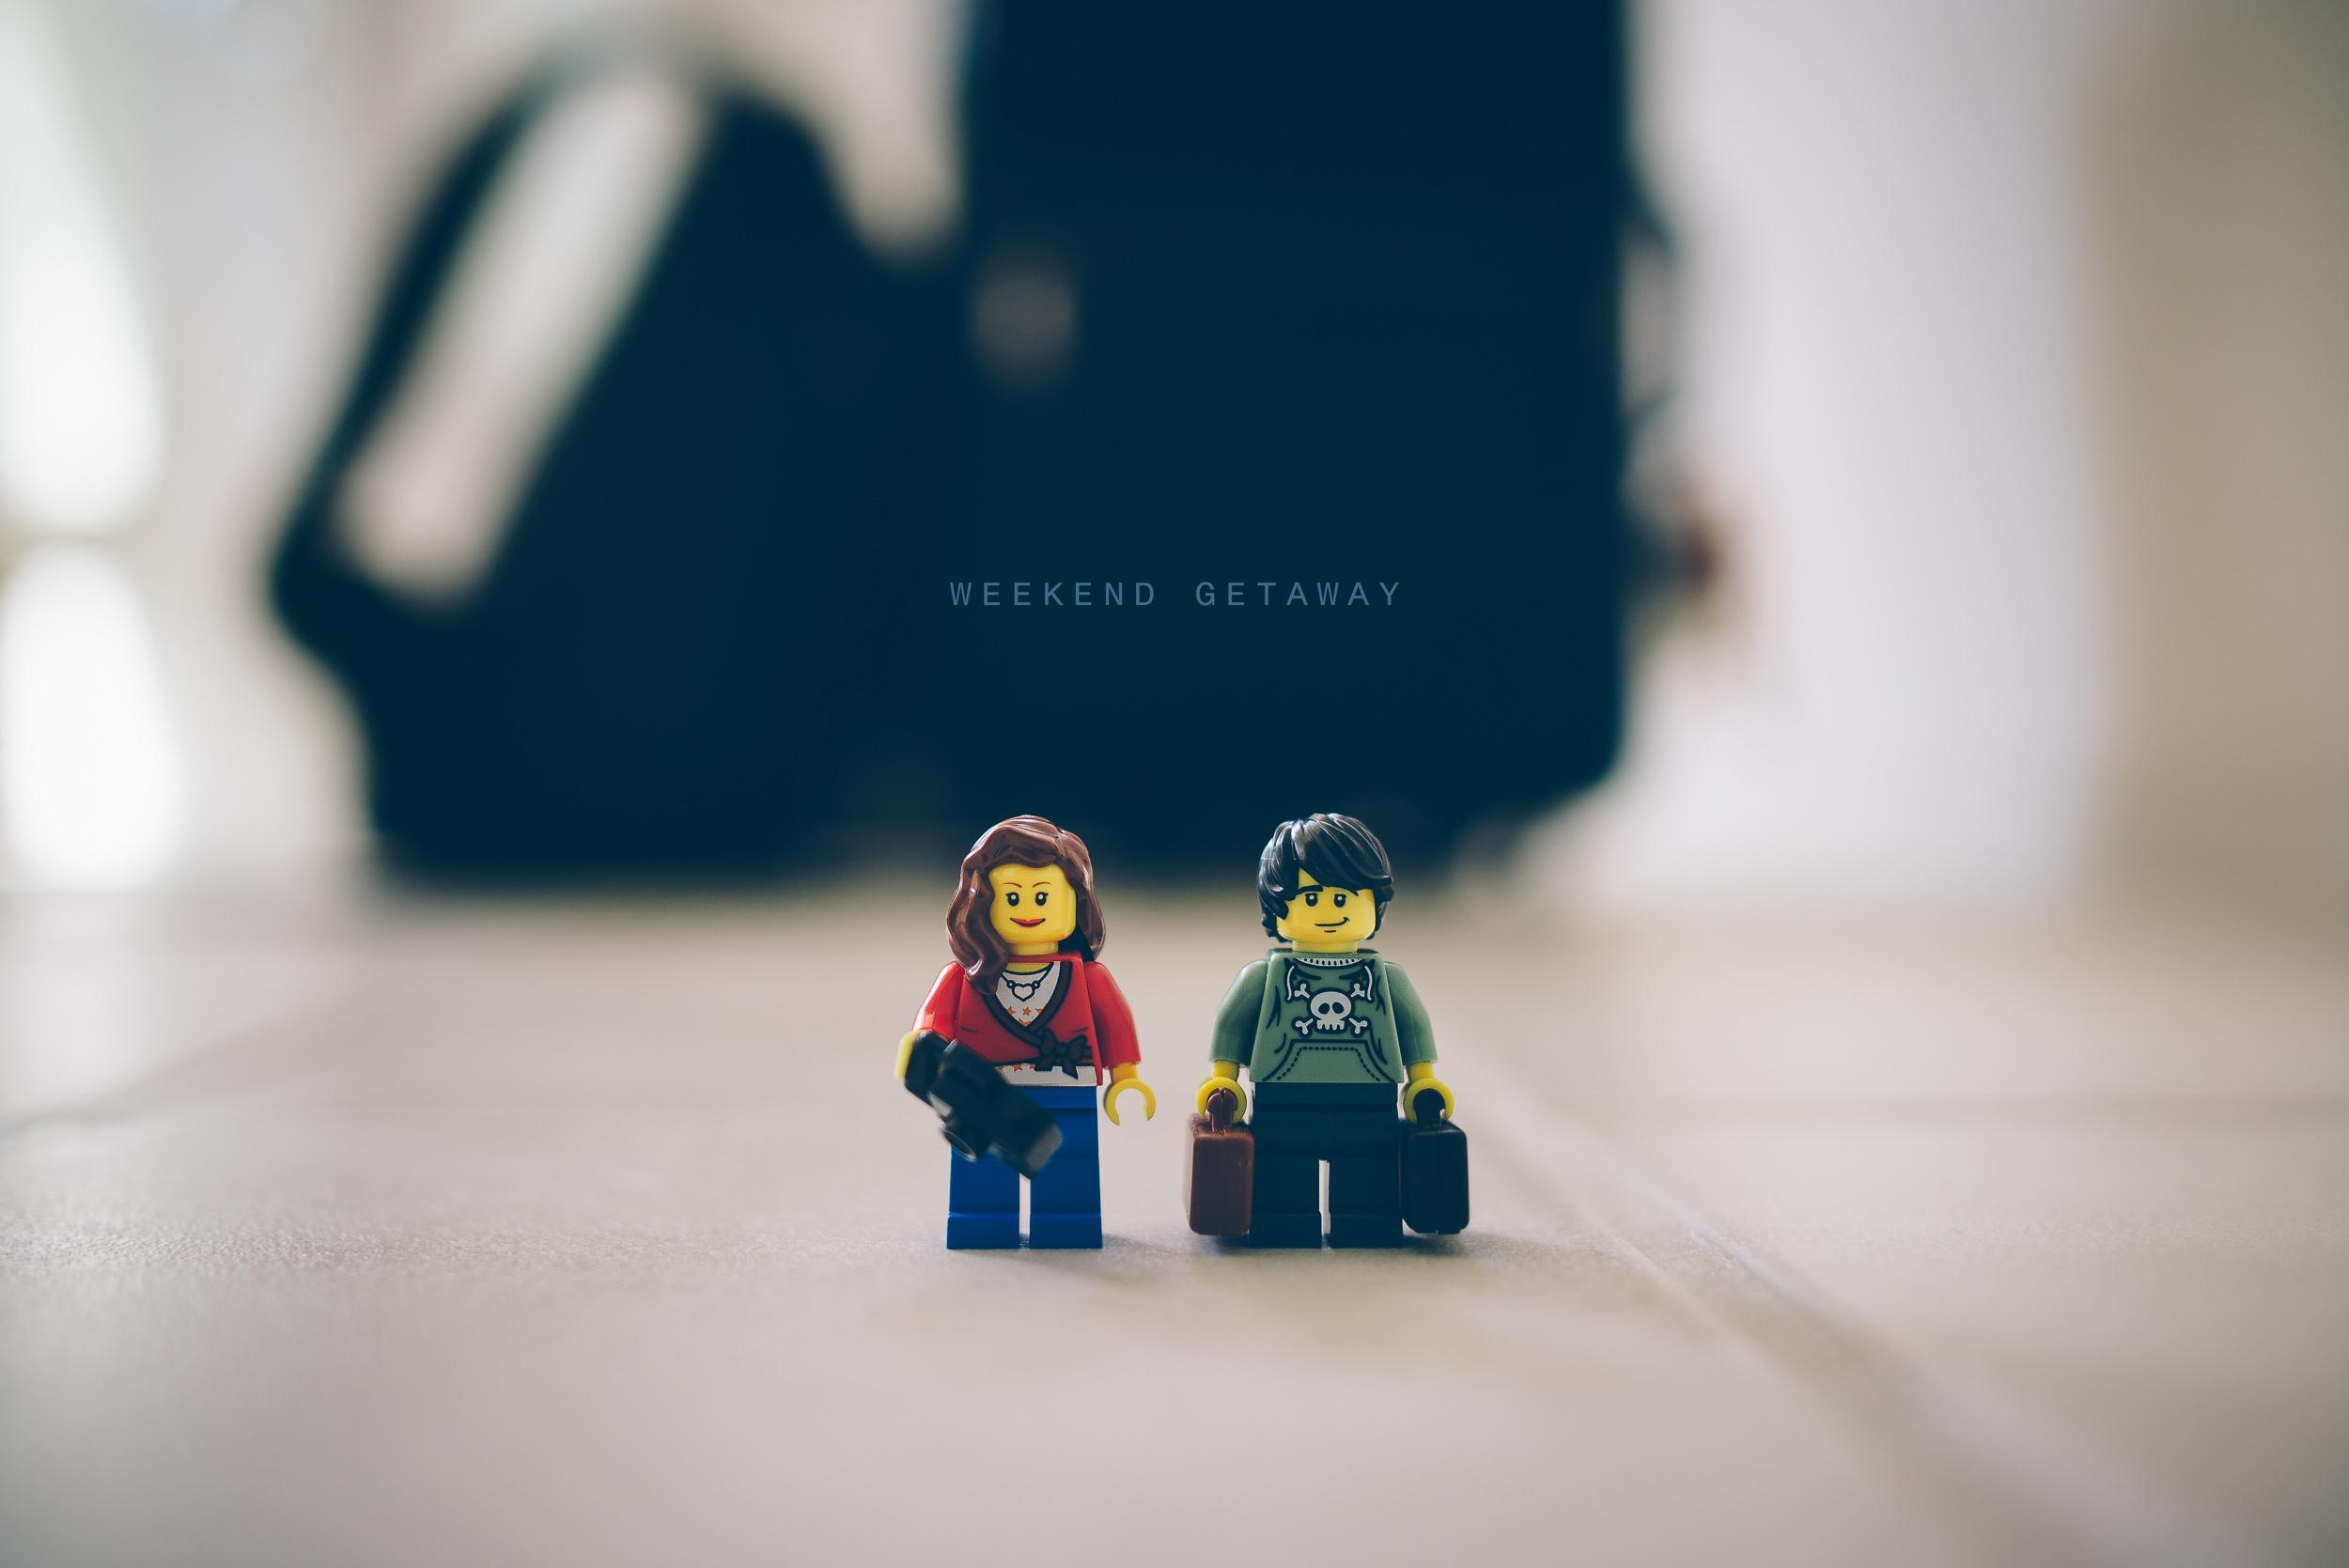 Lego-Portrait-Series-Reggie-Ballesteros-0016.jpg